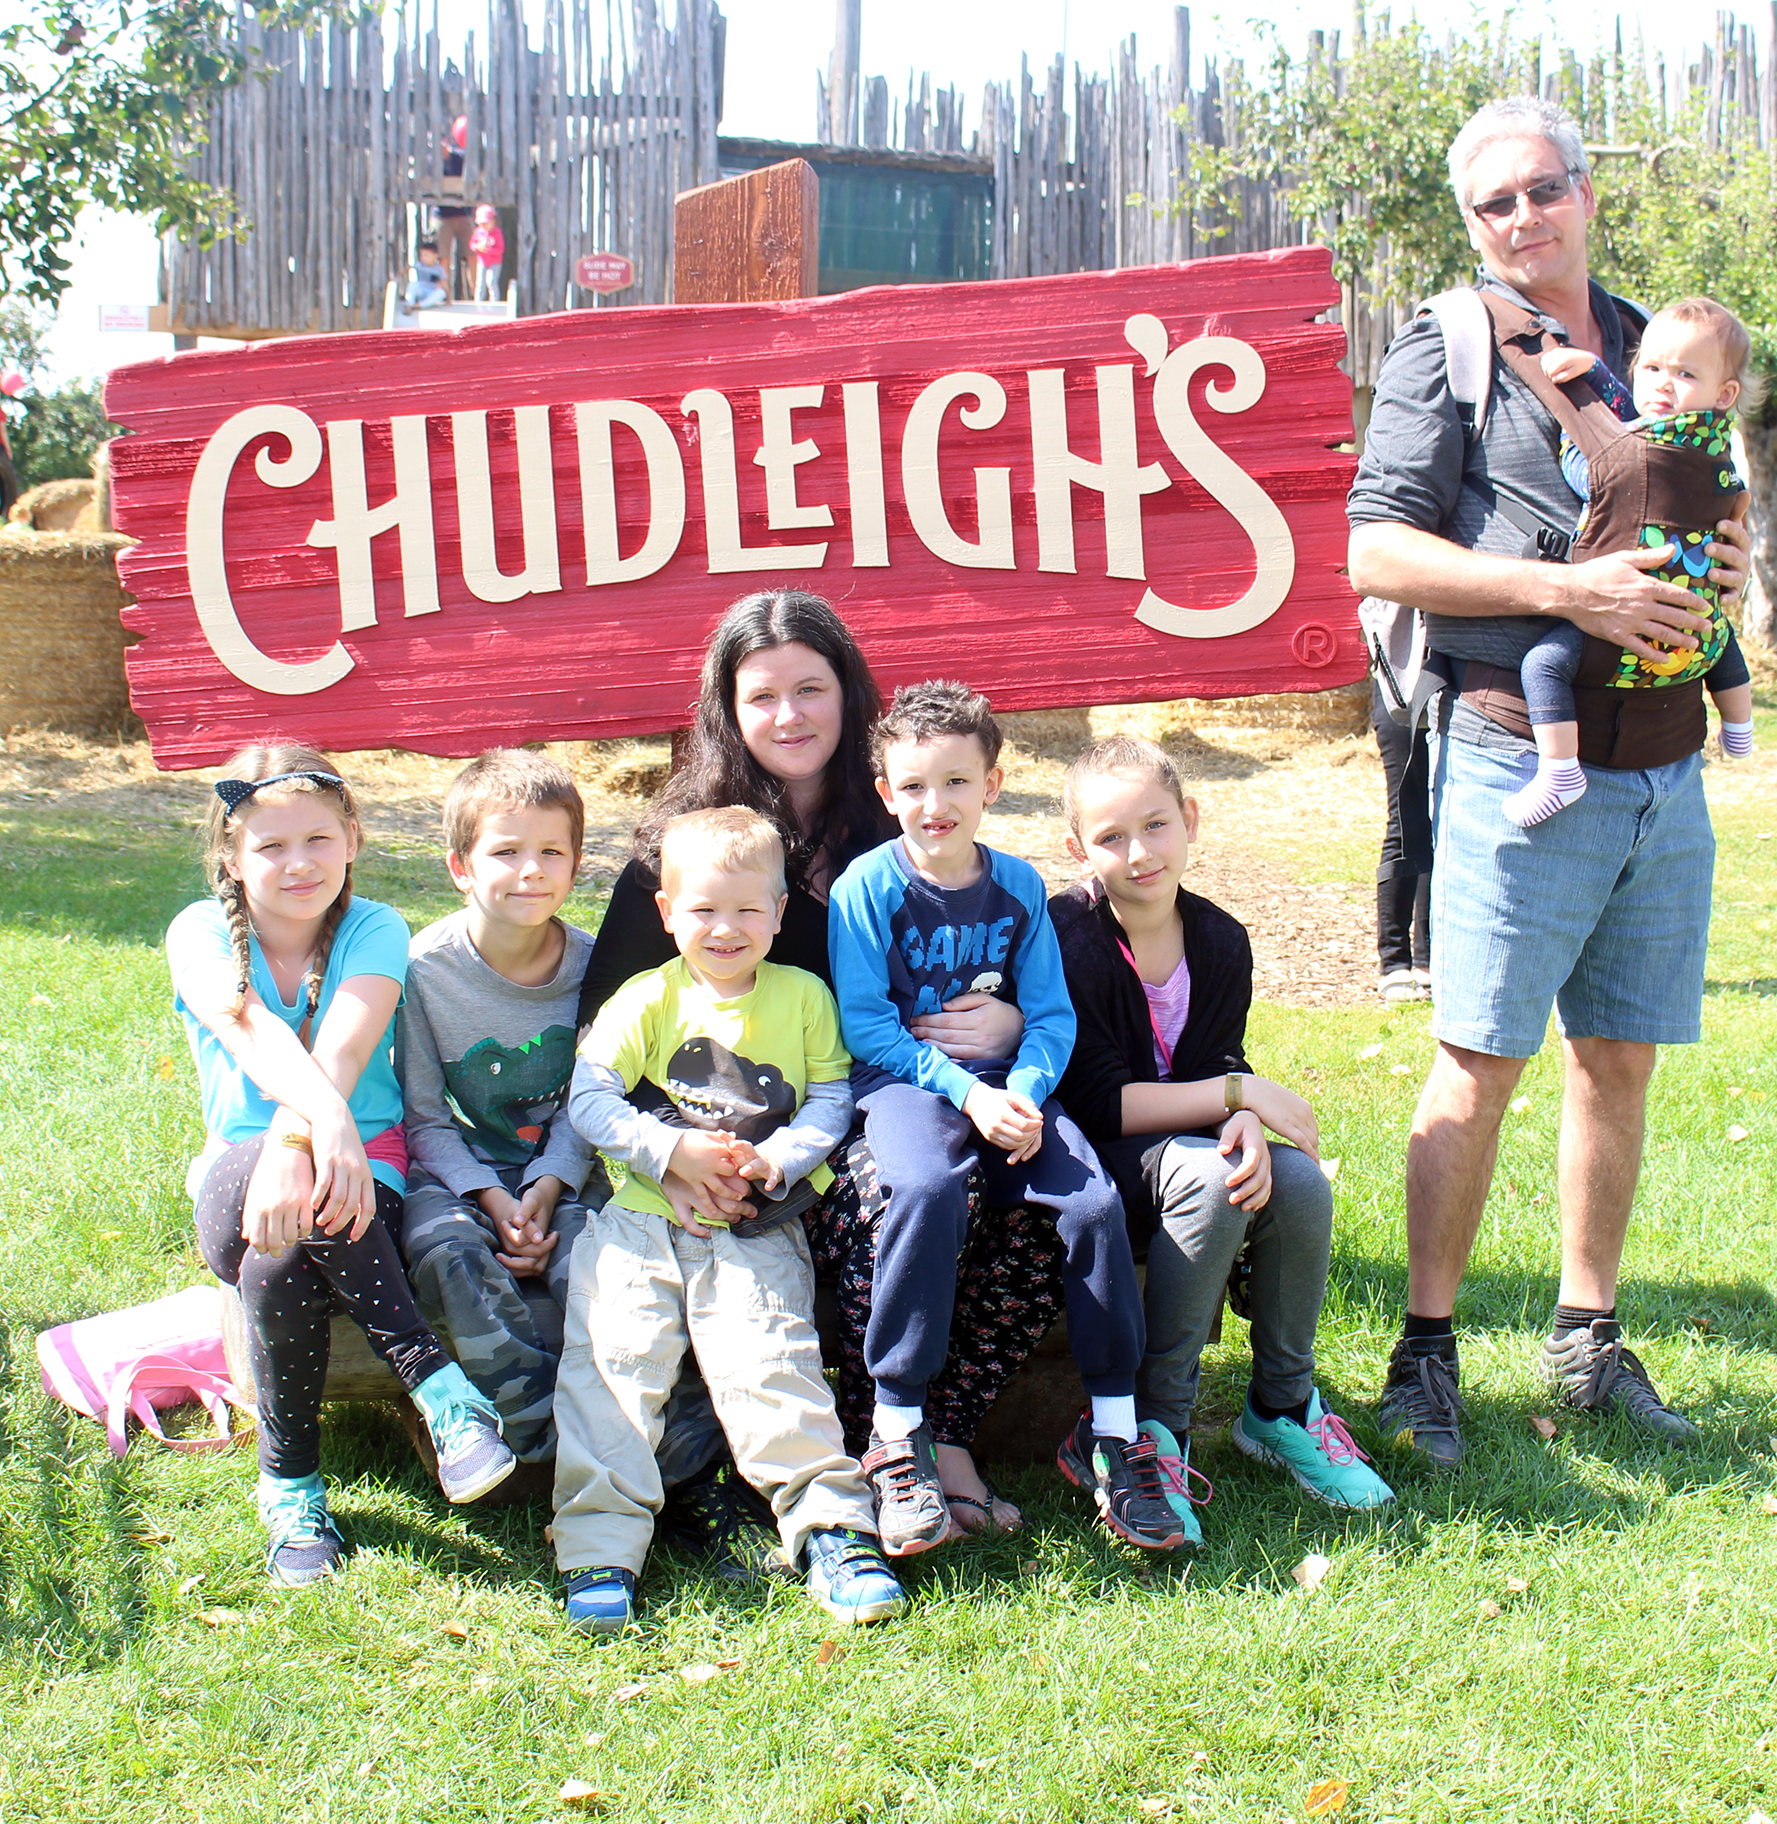 Exploring Chudleigh's Entertainment Farm